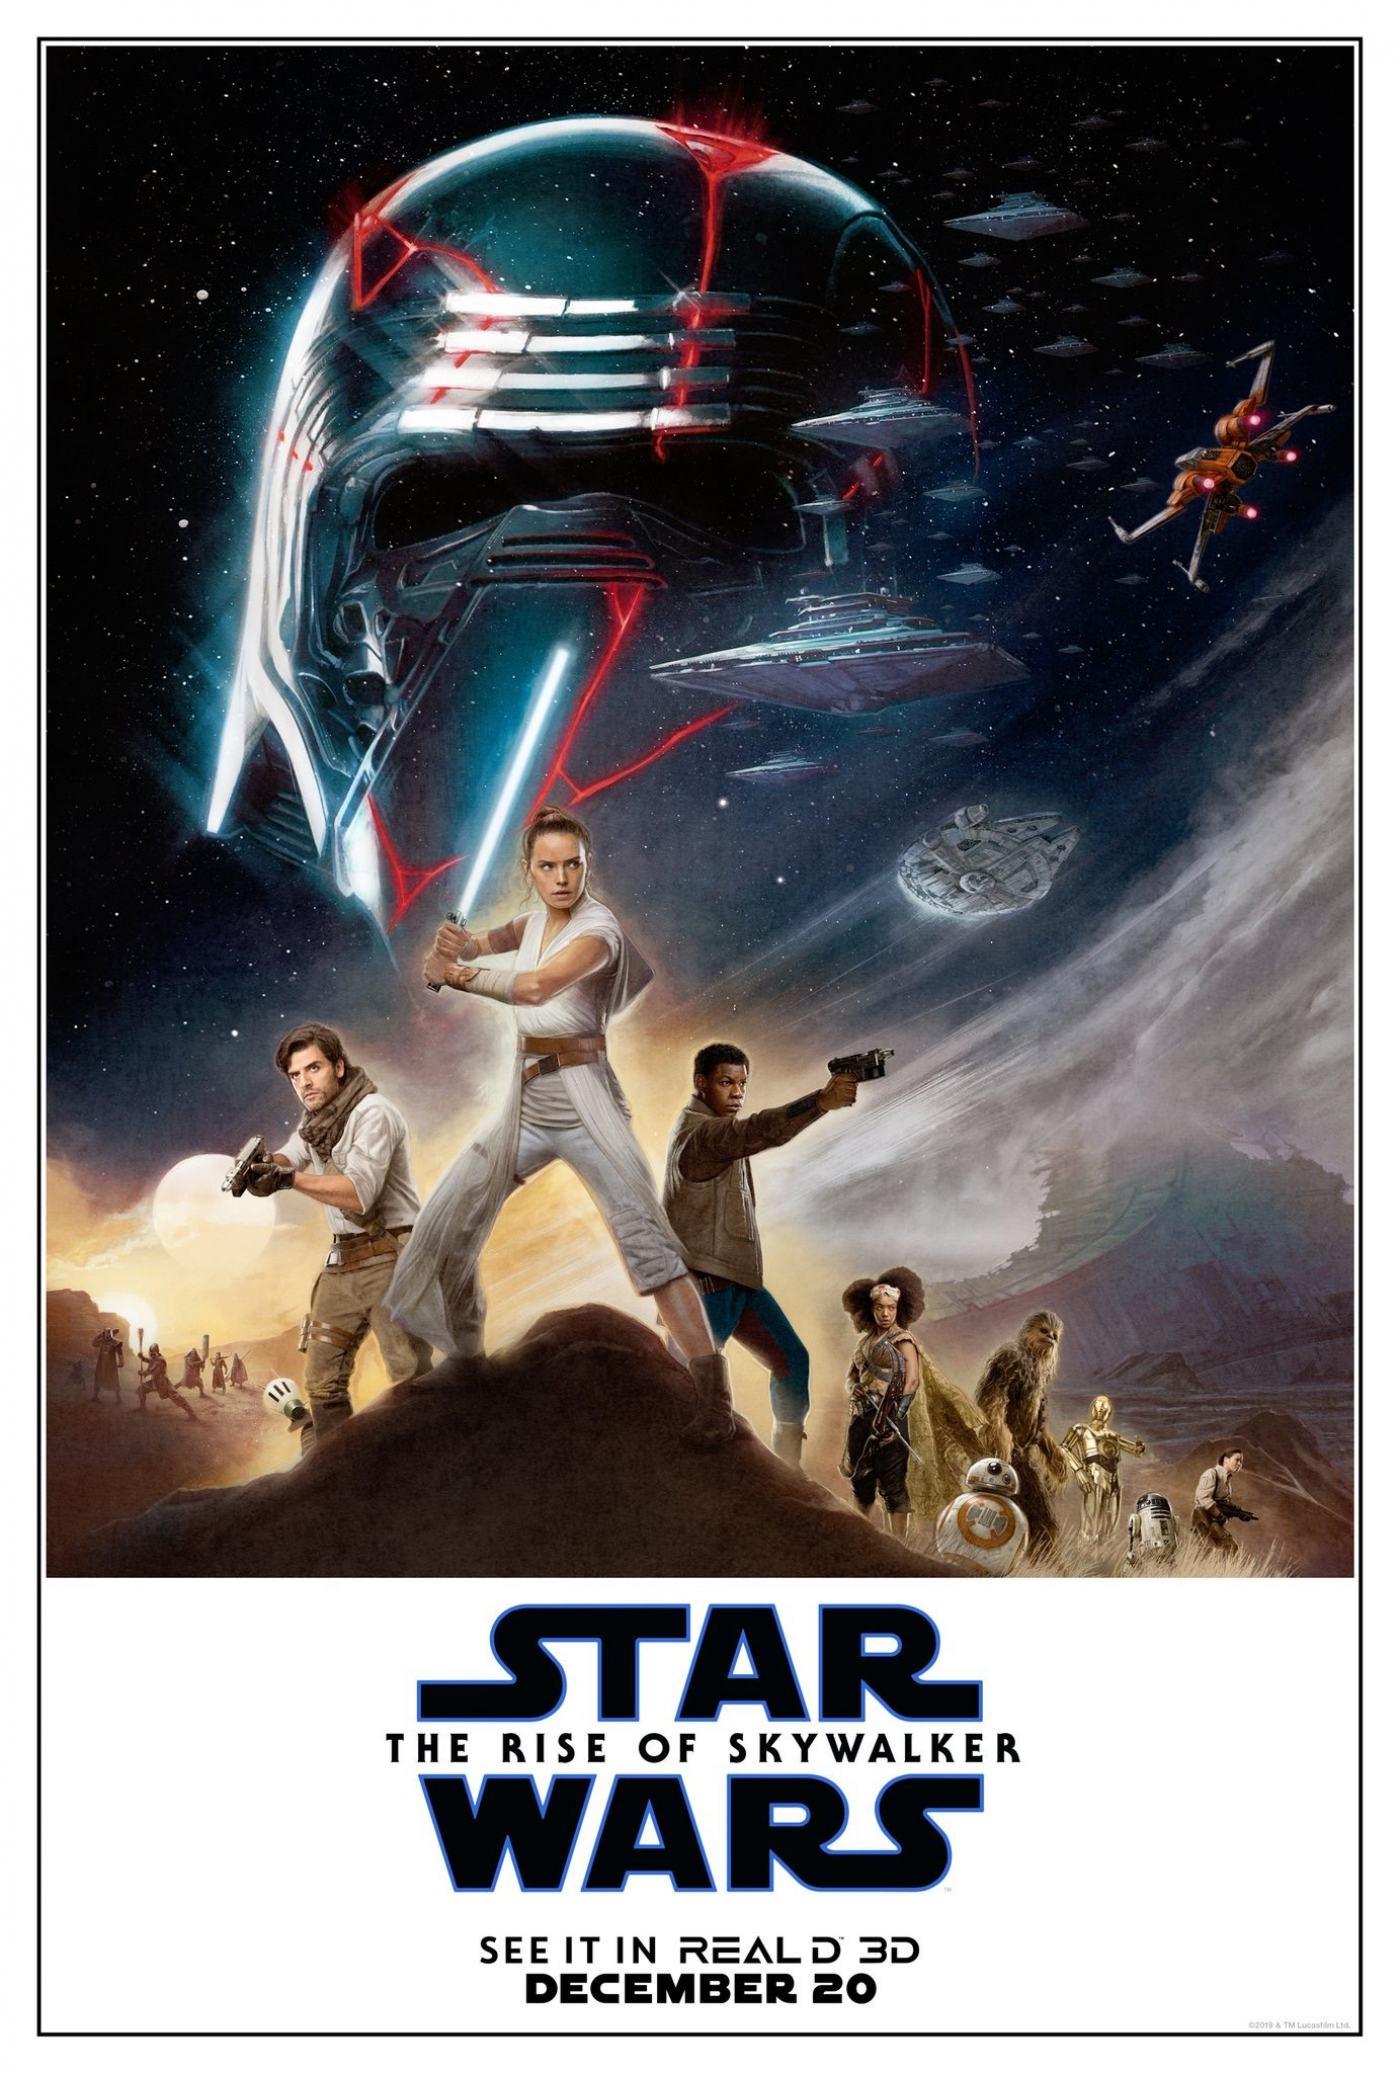 Star Wars: The Rise of Skywalker Poster #6